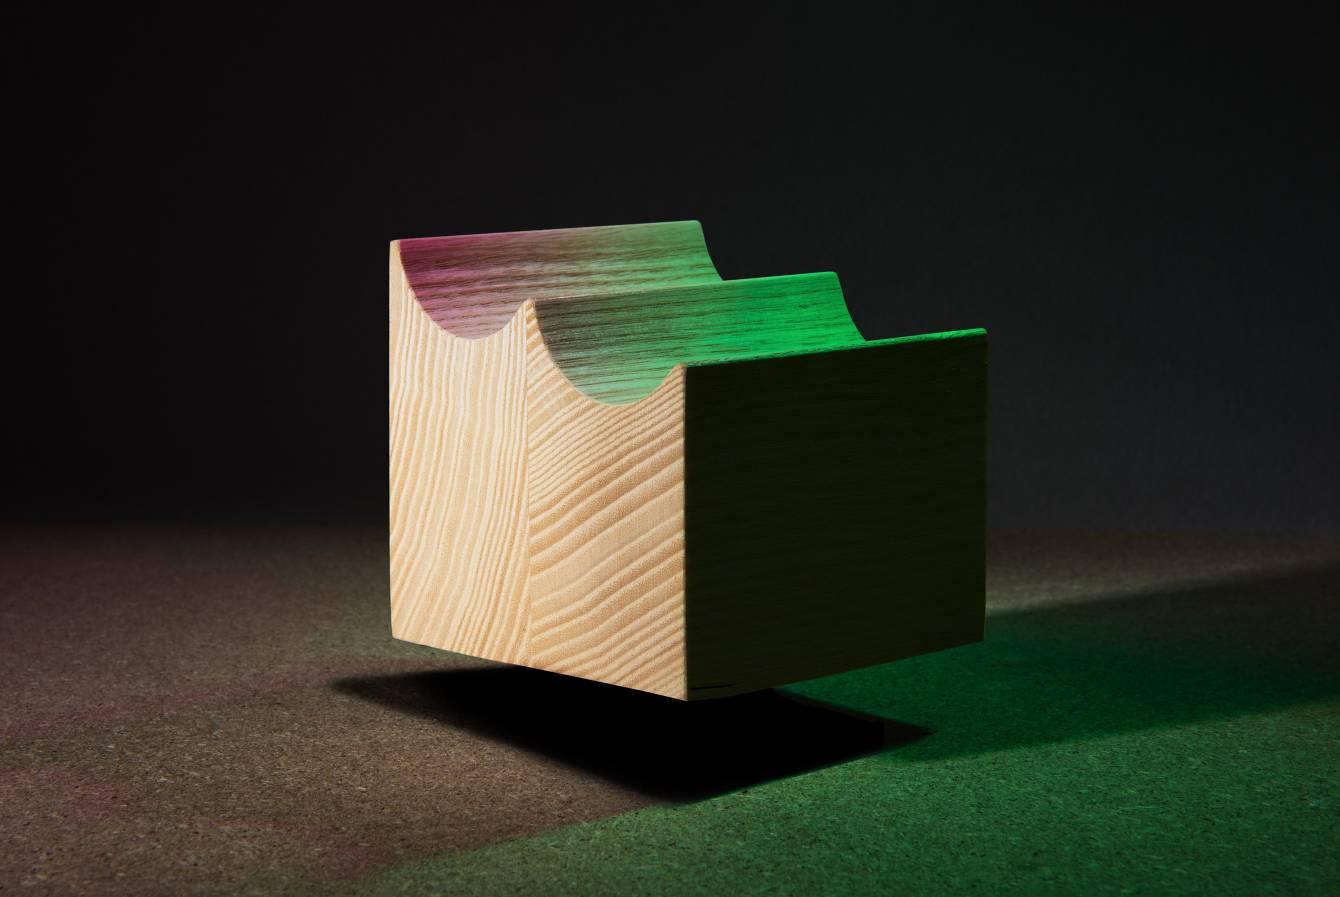 UU desk tray by Linn Kandel, Dimitri Bähler and Ismaël Studer | Flodeau.com